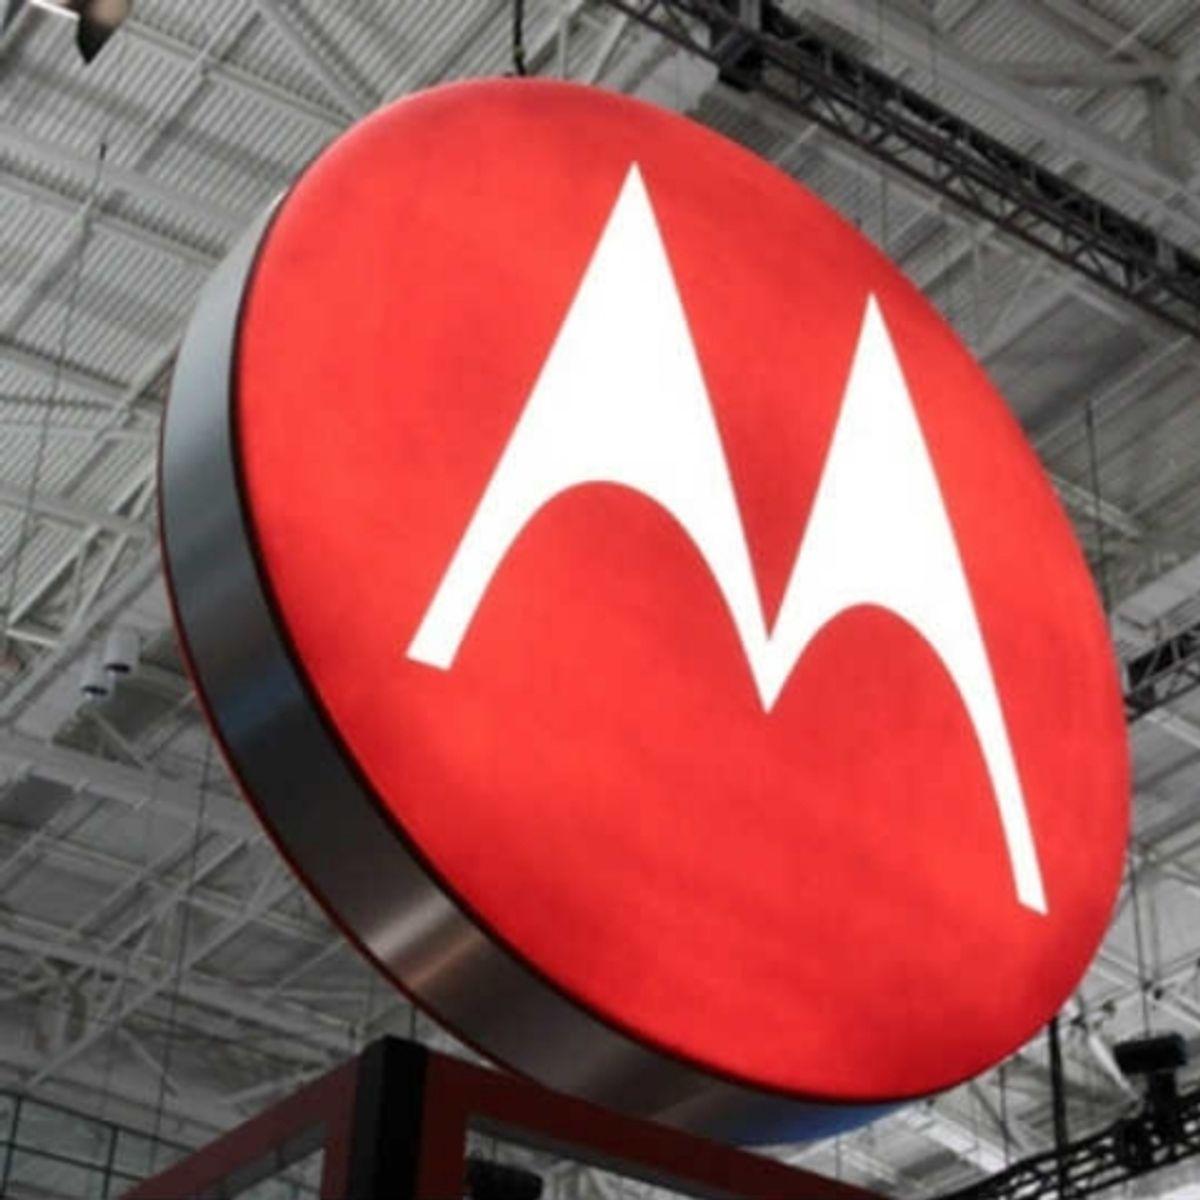 Motorola G7 Power might feature 5000mAh battery, run on